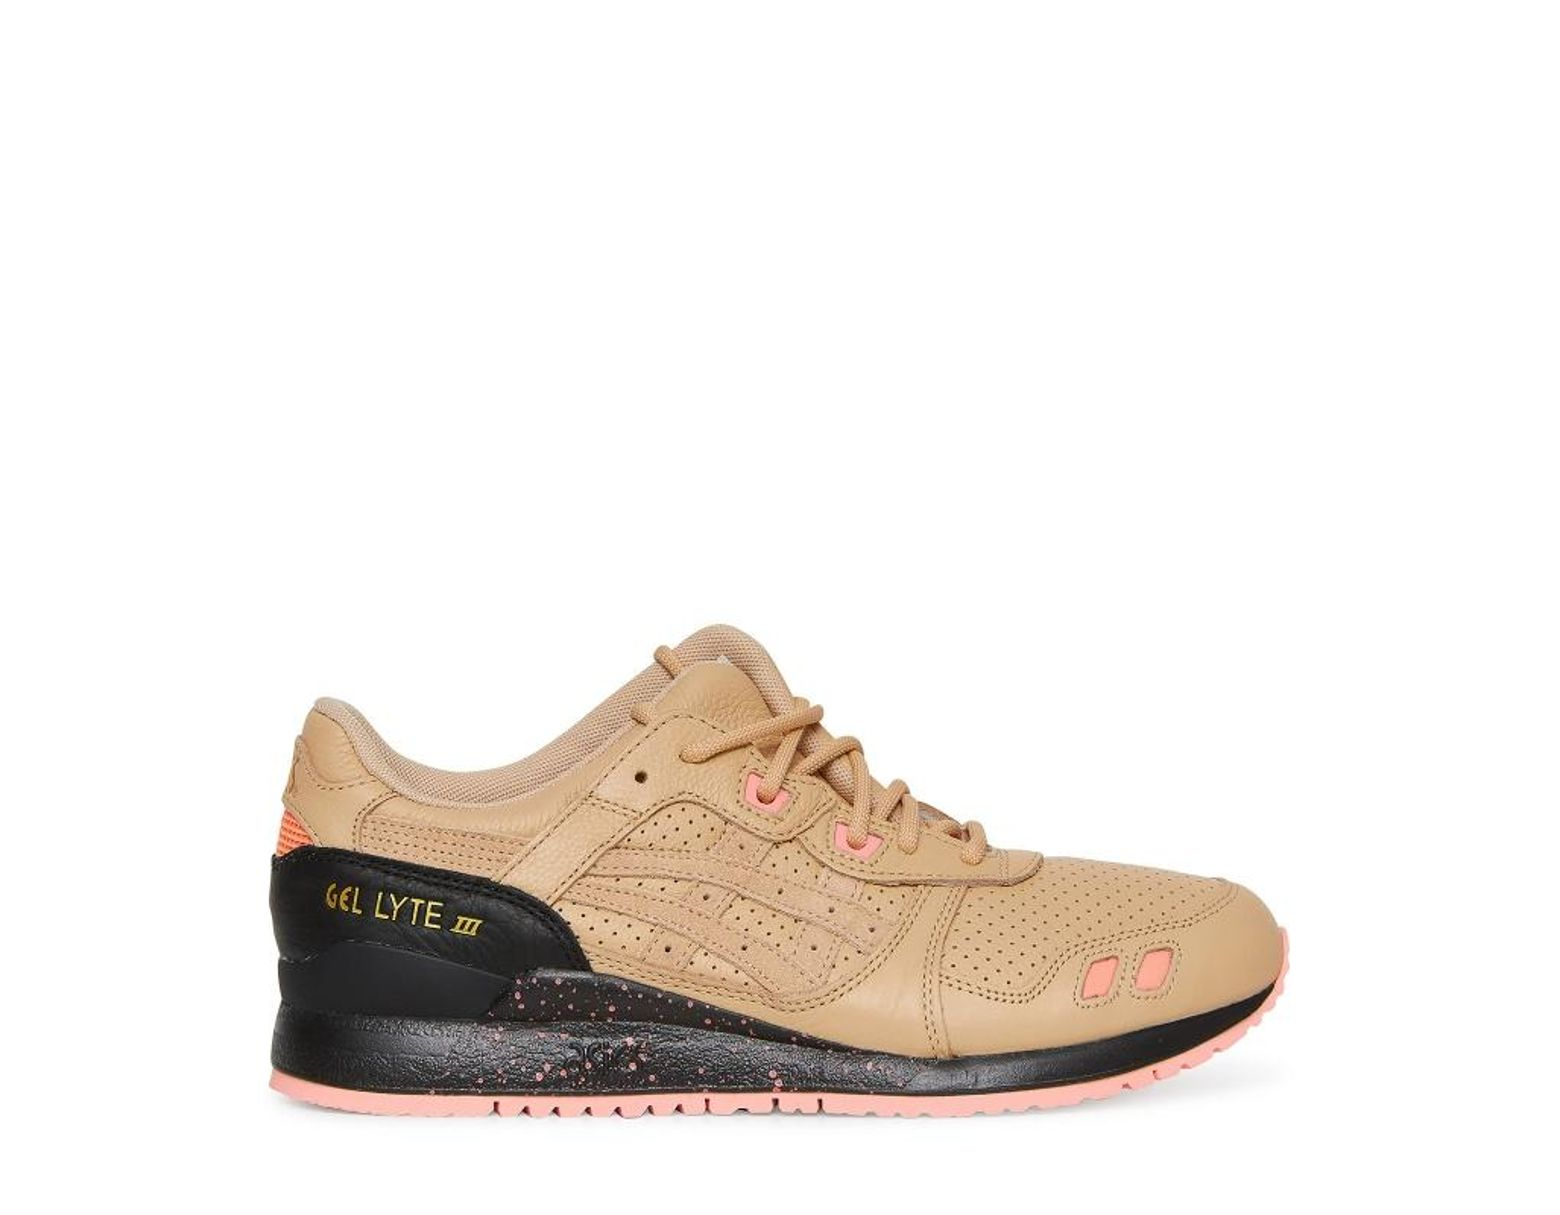 low priced 8a3b2 7781c Women's Sneakerfreaker Gel-lyte Iii 'tiger Snake' Sneakers